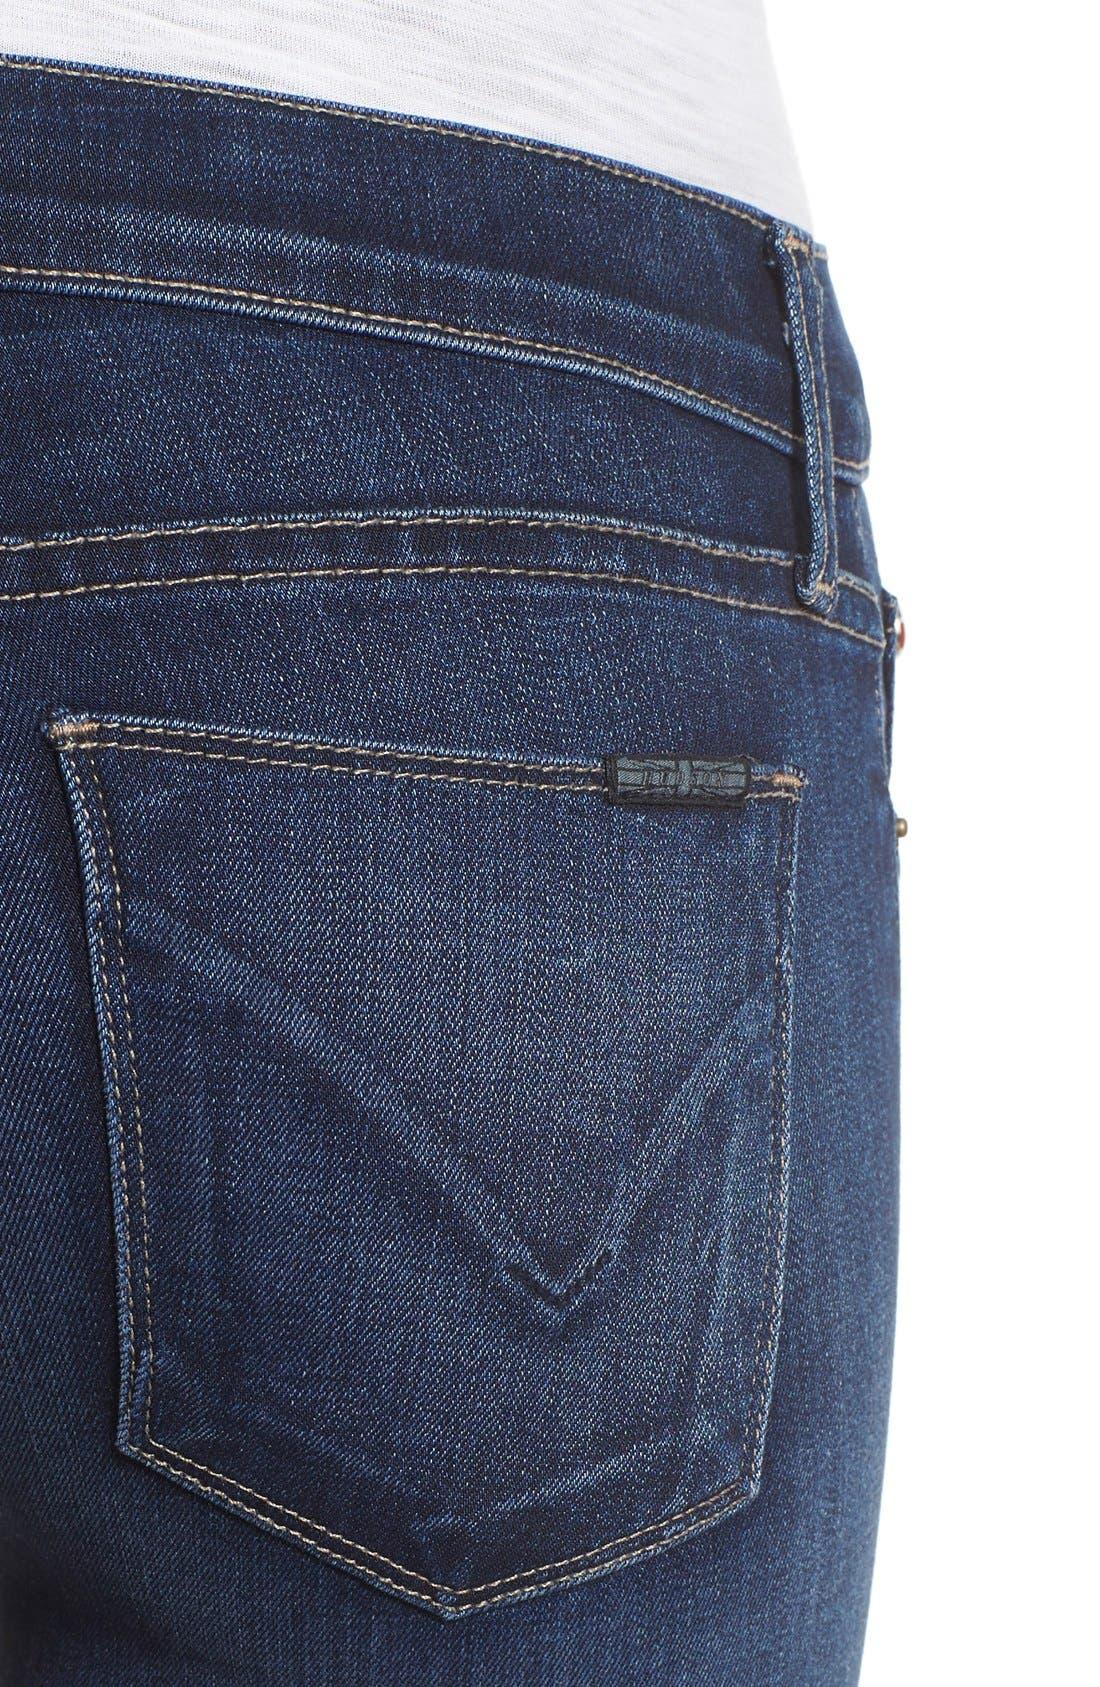 'Krista' Release Hem Jeans,                             Alternate thumbnail 5, color,                             402